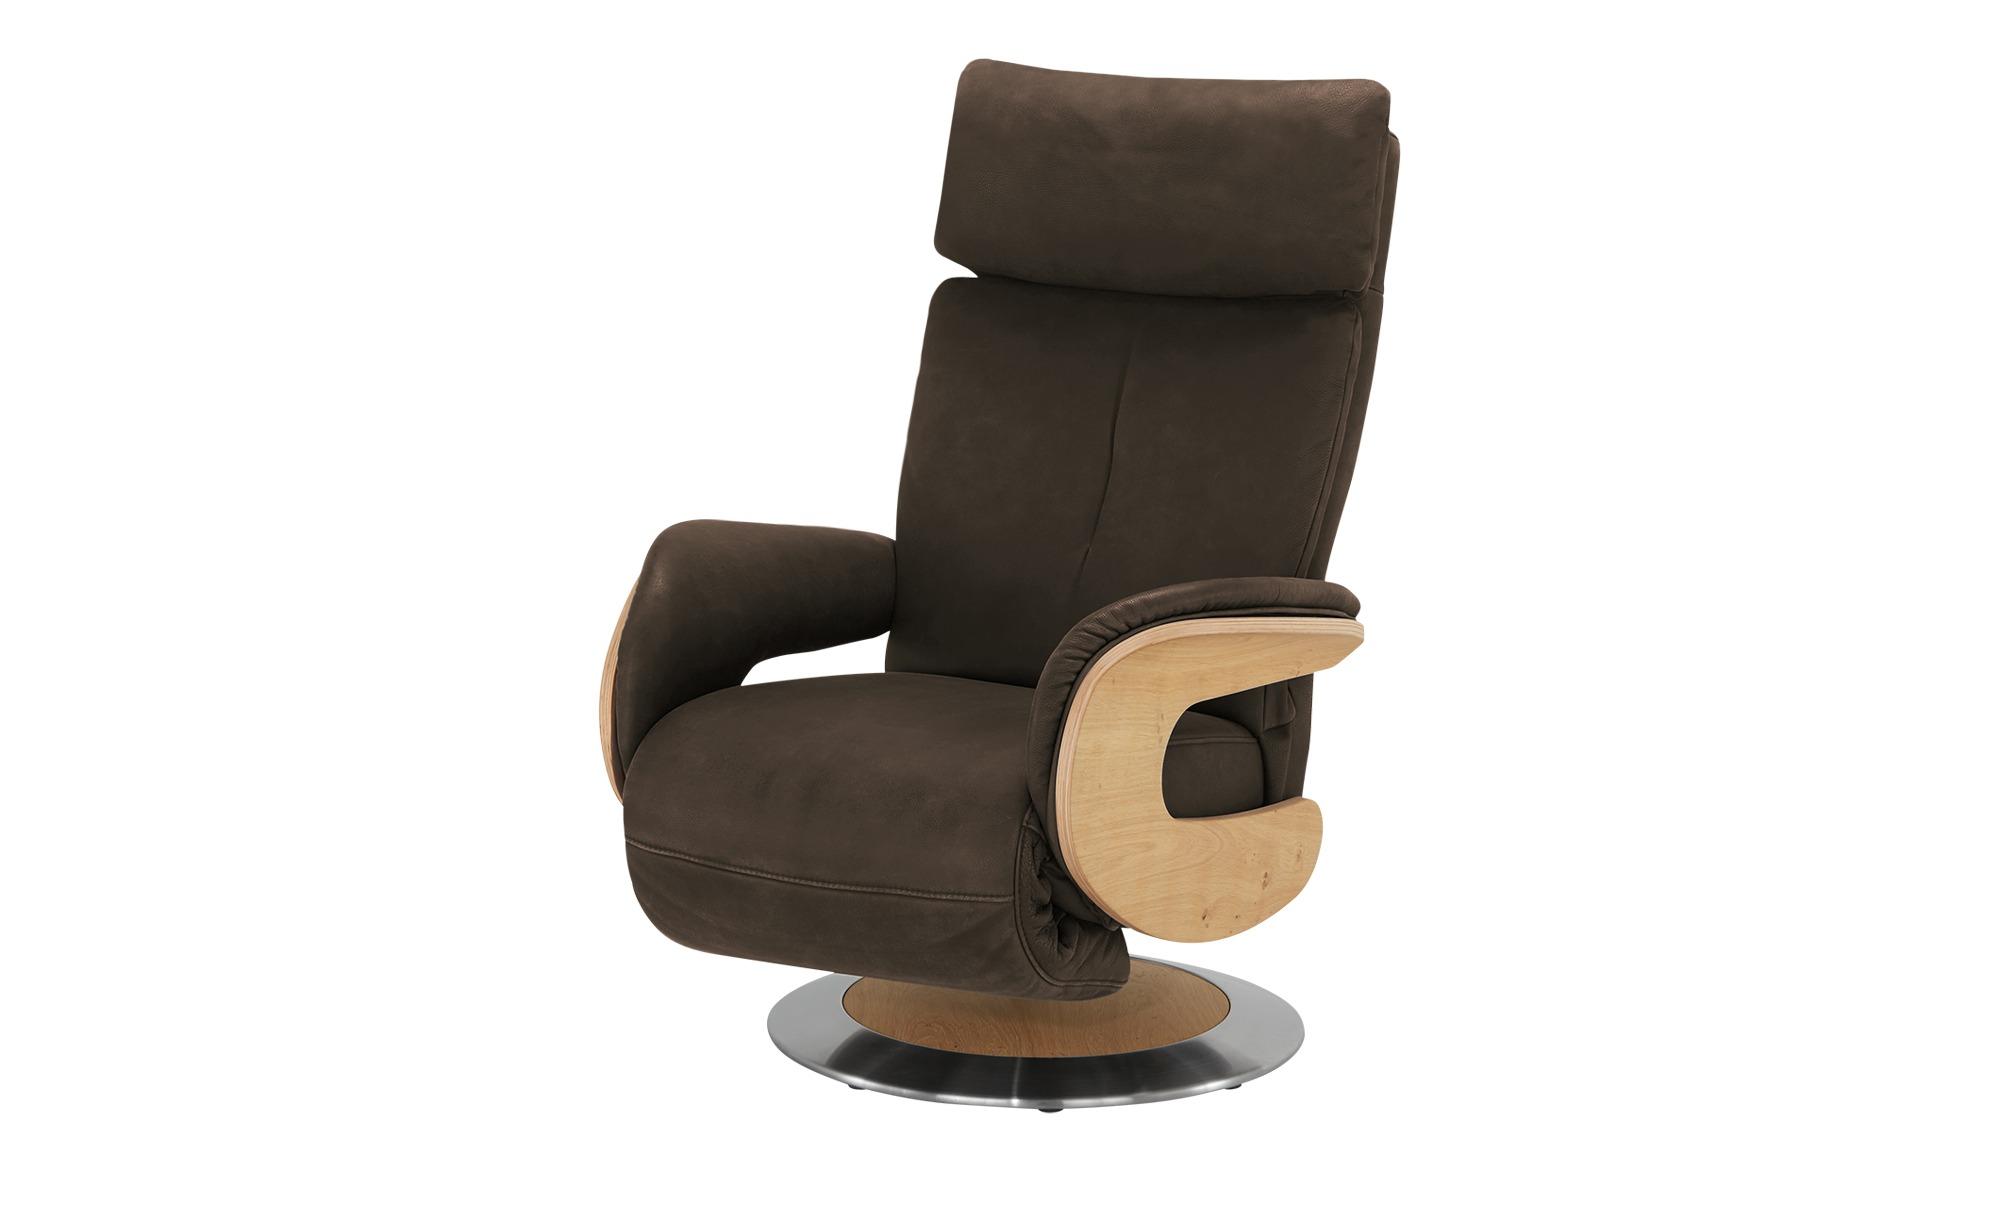 himolla Funktionssessel Leder  7818 ¦ braun ¦ Maße (cm): B: 75 H: 112 T: 87 Polstermöbel > Sessel > Fernsehsessel - Höffner